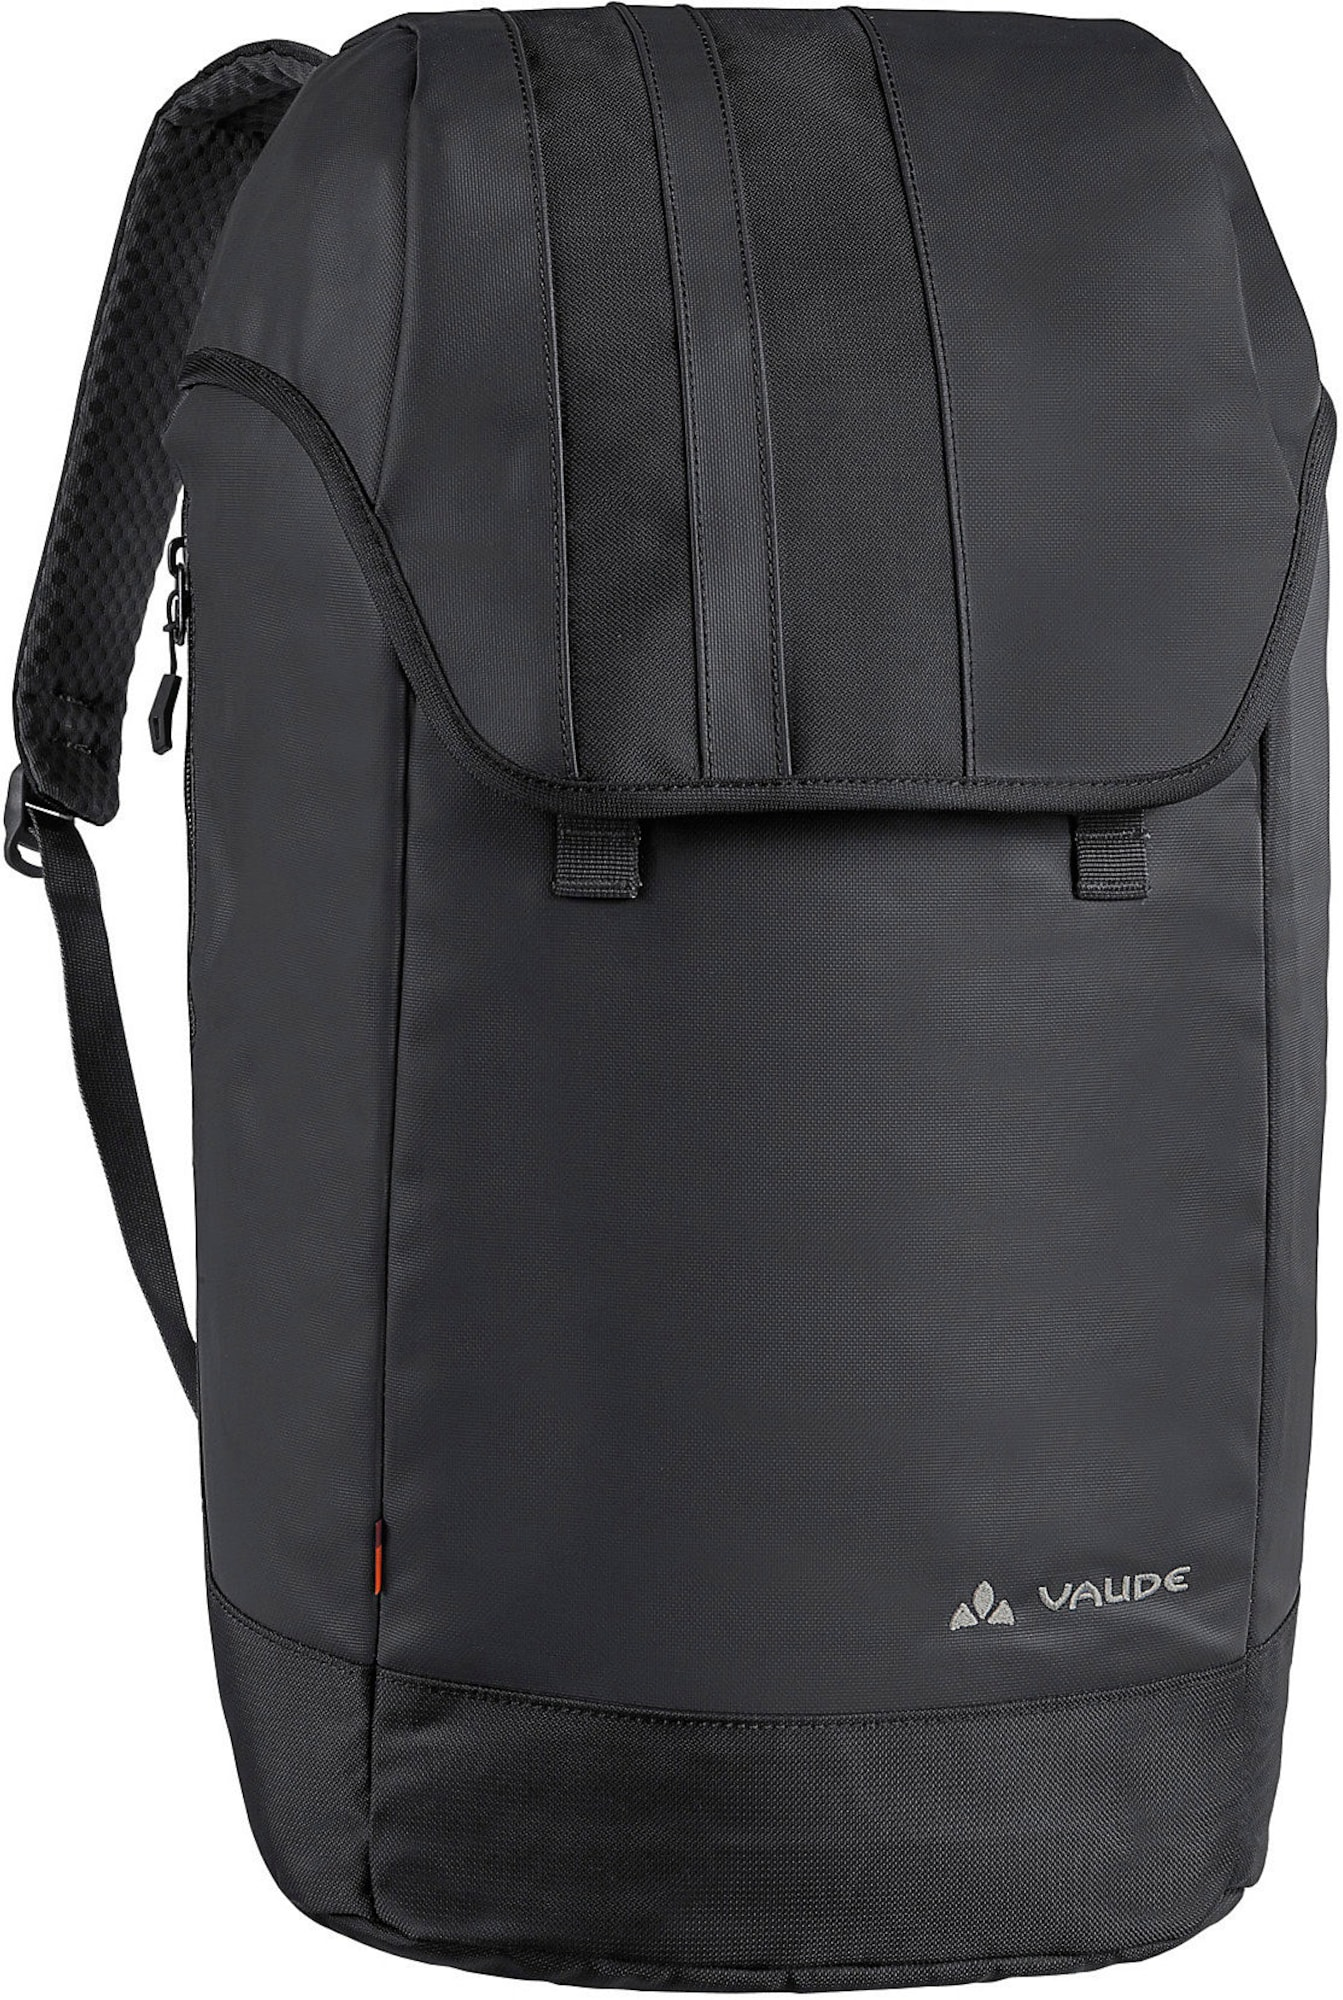 Amir Daypack   Taschen > Rucksäcke > Tagesrucksäcke   Vaude